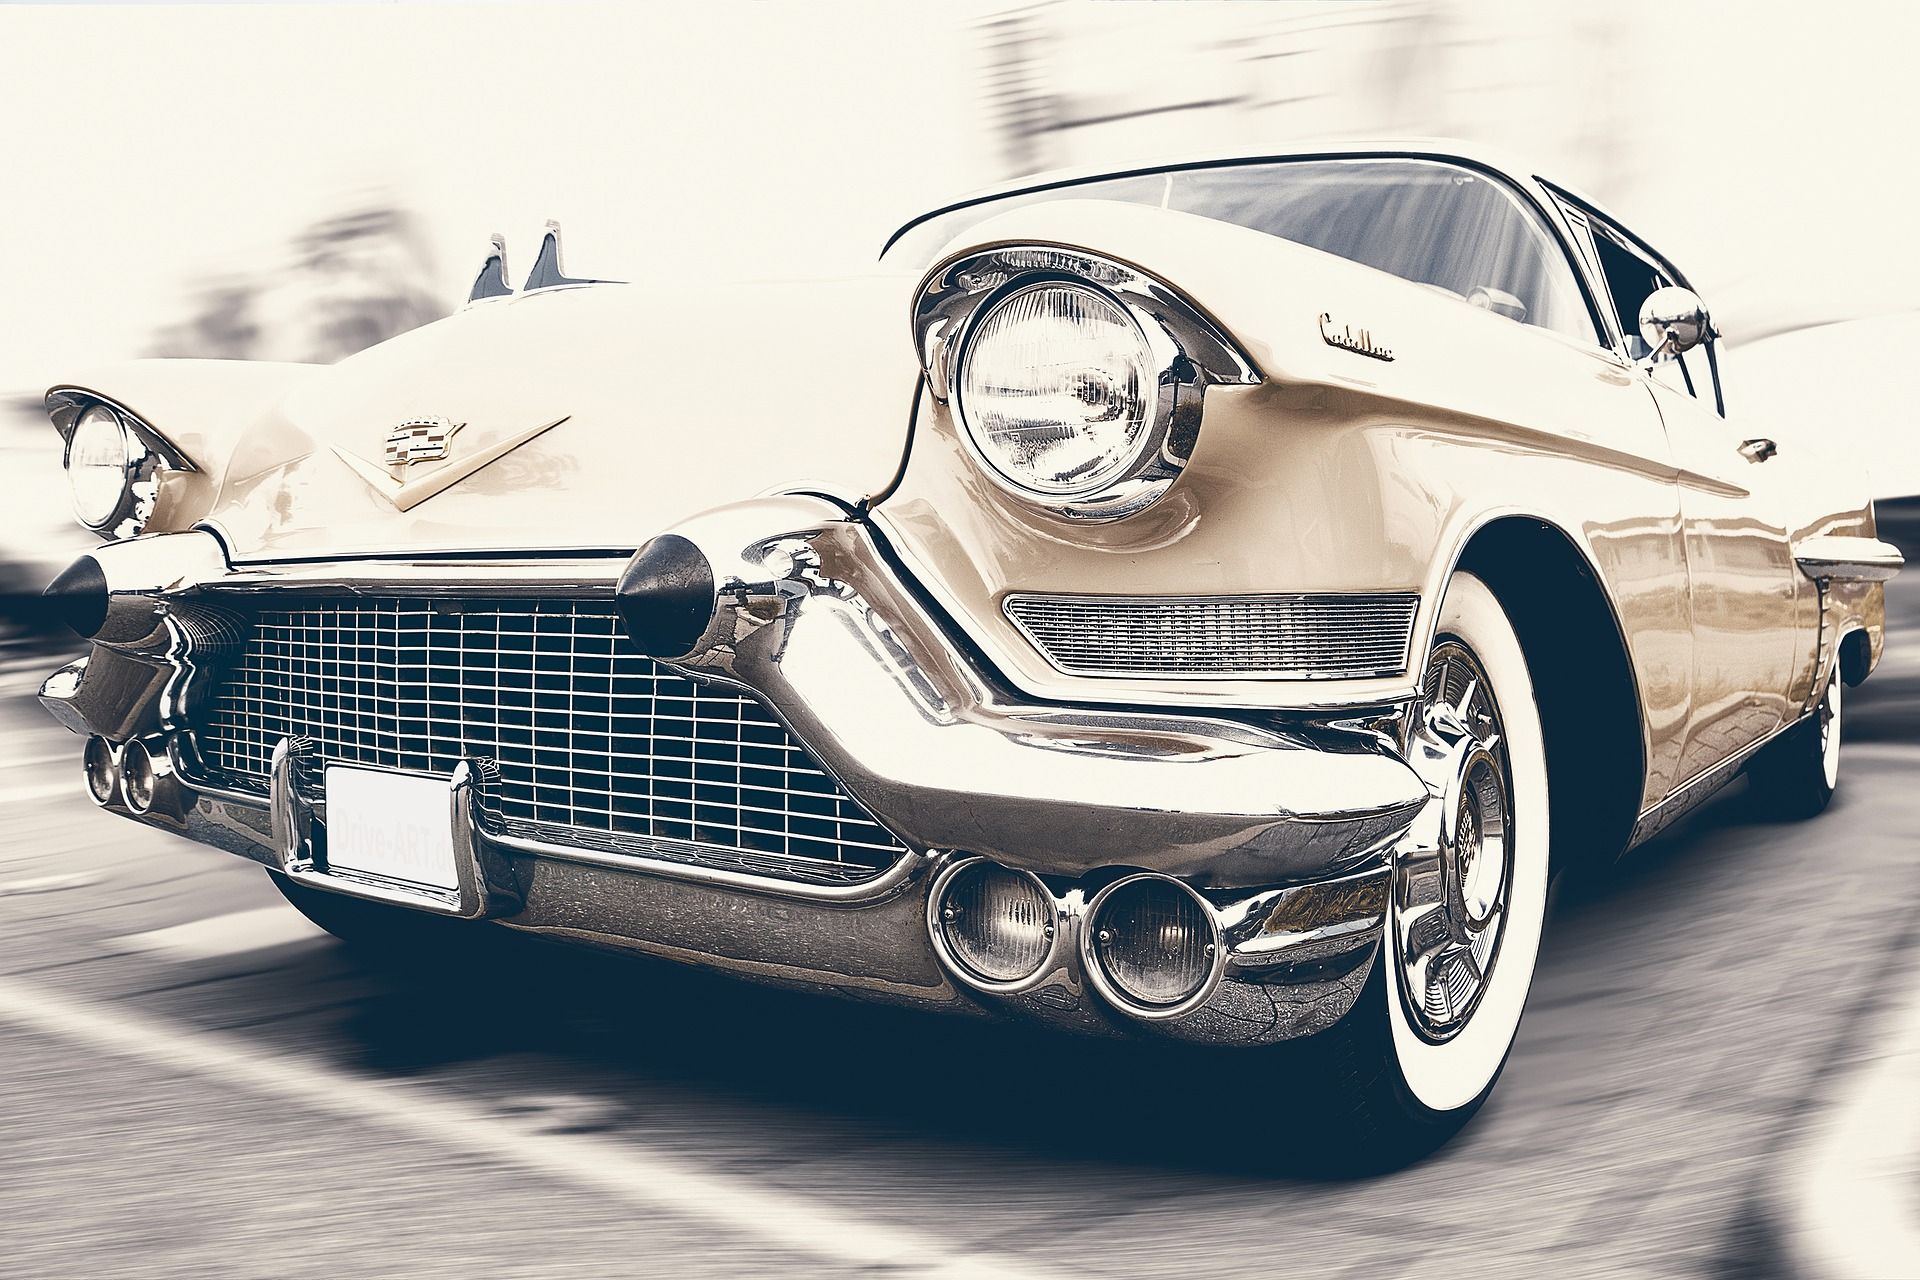 Autoaufbereitung bei Leasingfahrzeugen